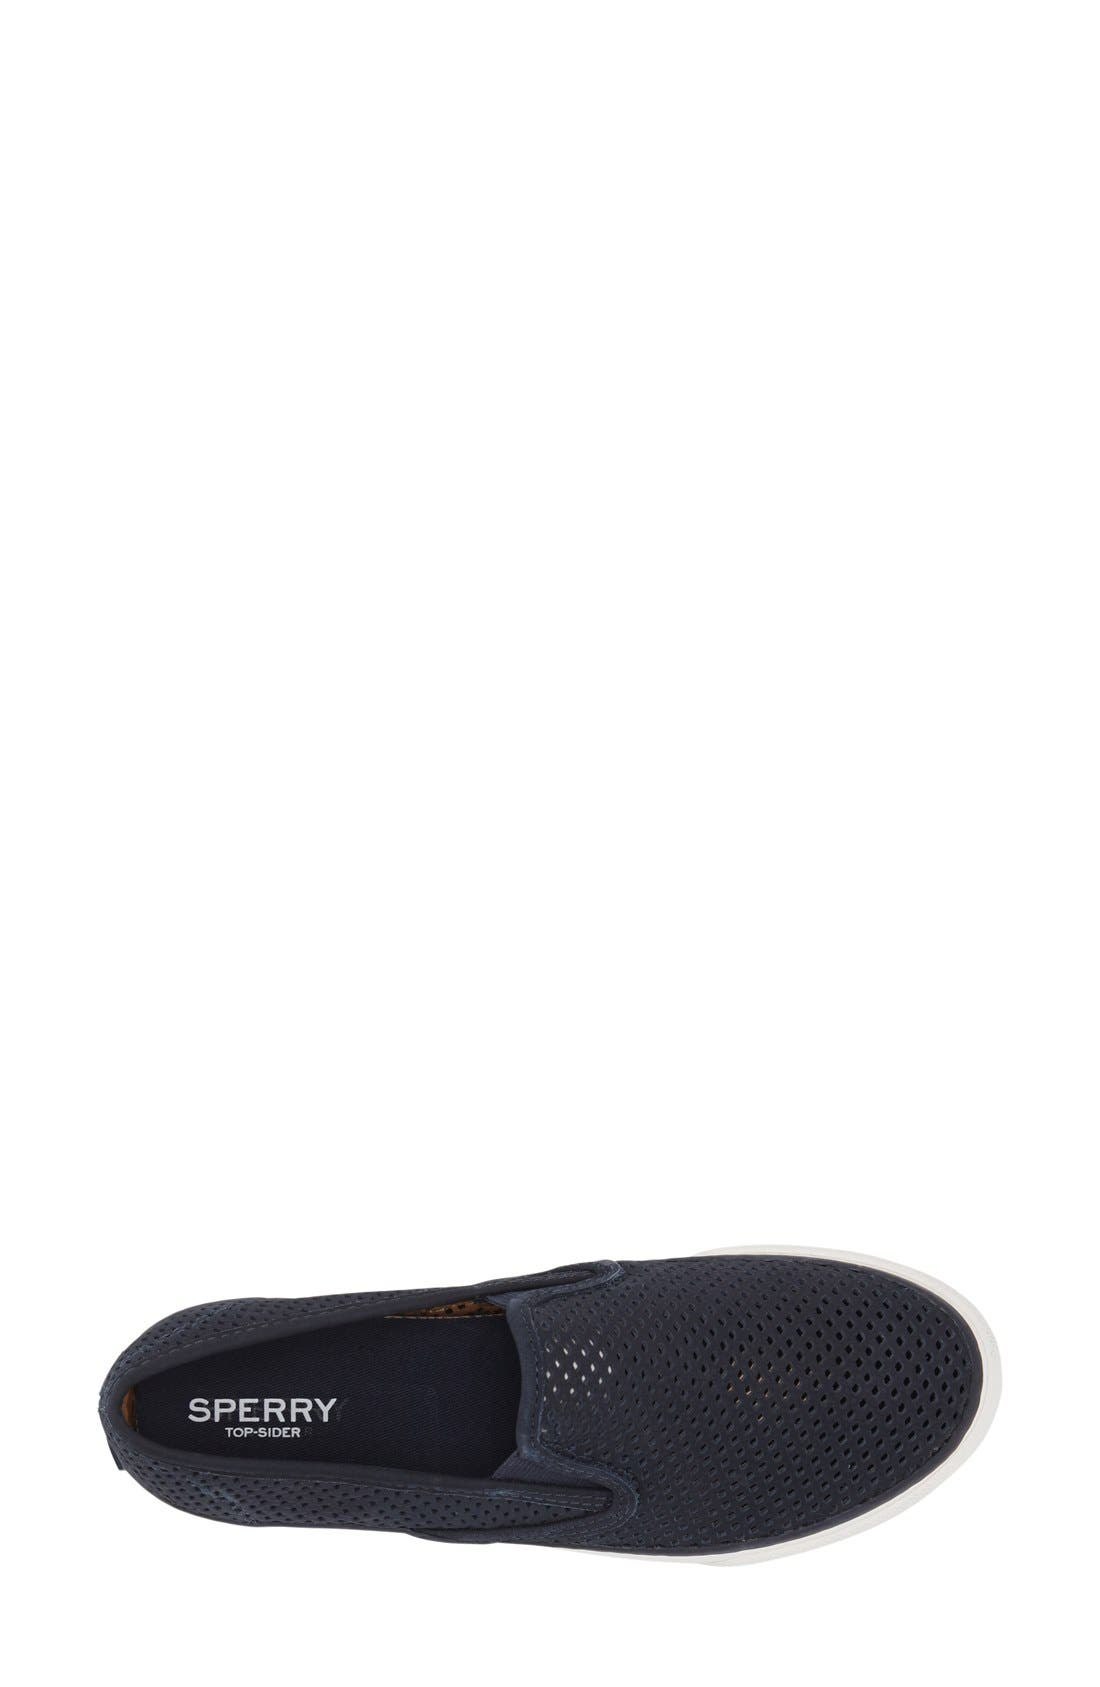 Alternate Image 3  - Sperry 'Seaside' Perforated Slip-On Sneaker (Women)